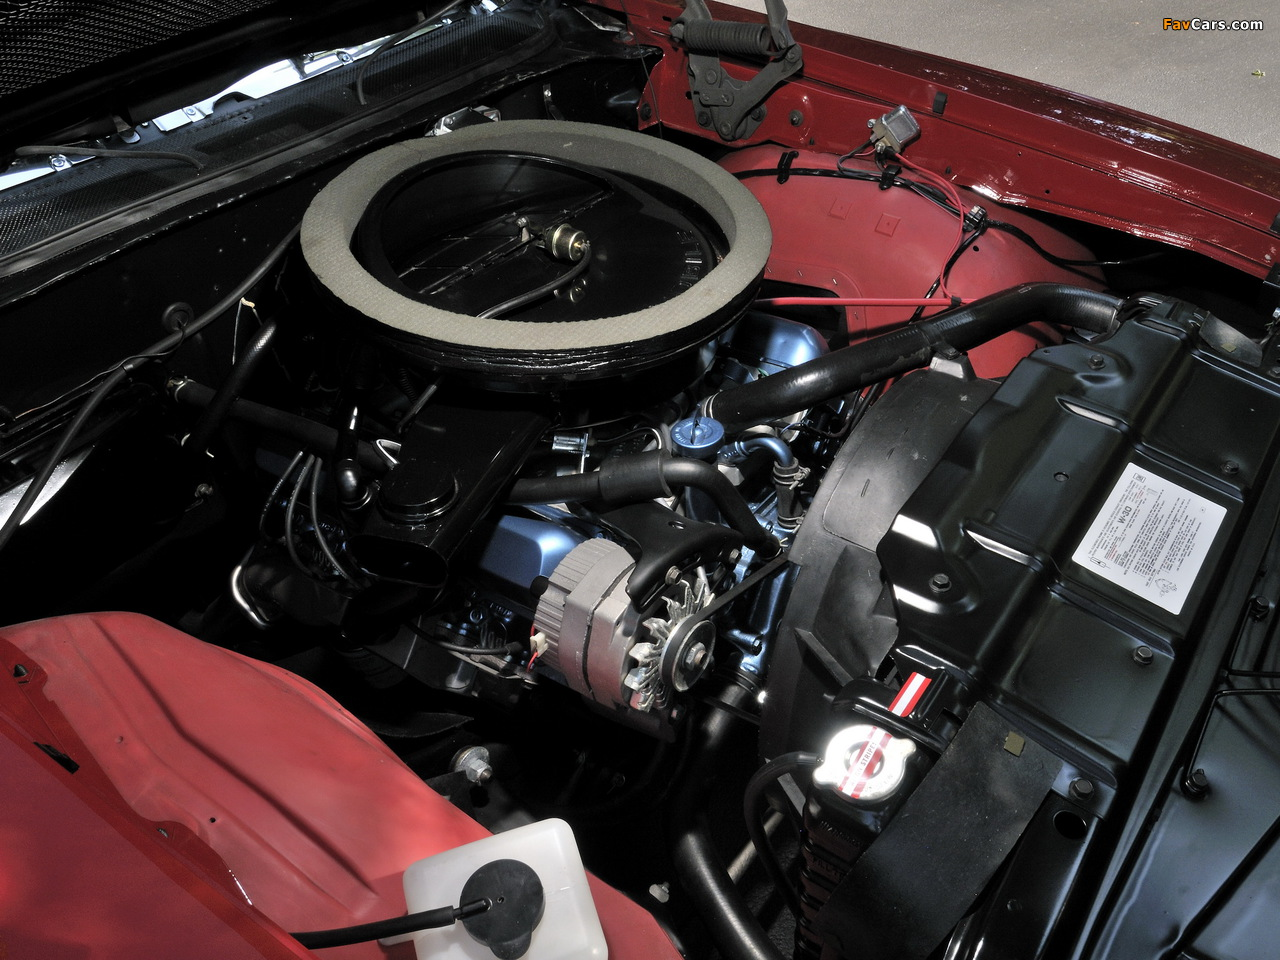 Oldsmobile 442 W-30 Sport Coupe (4477) 1970 photos (1280 x 960)